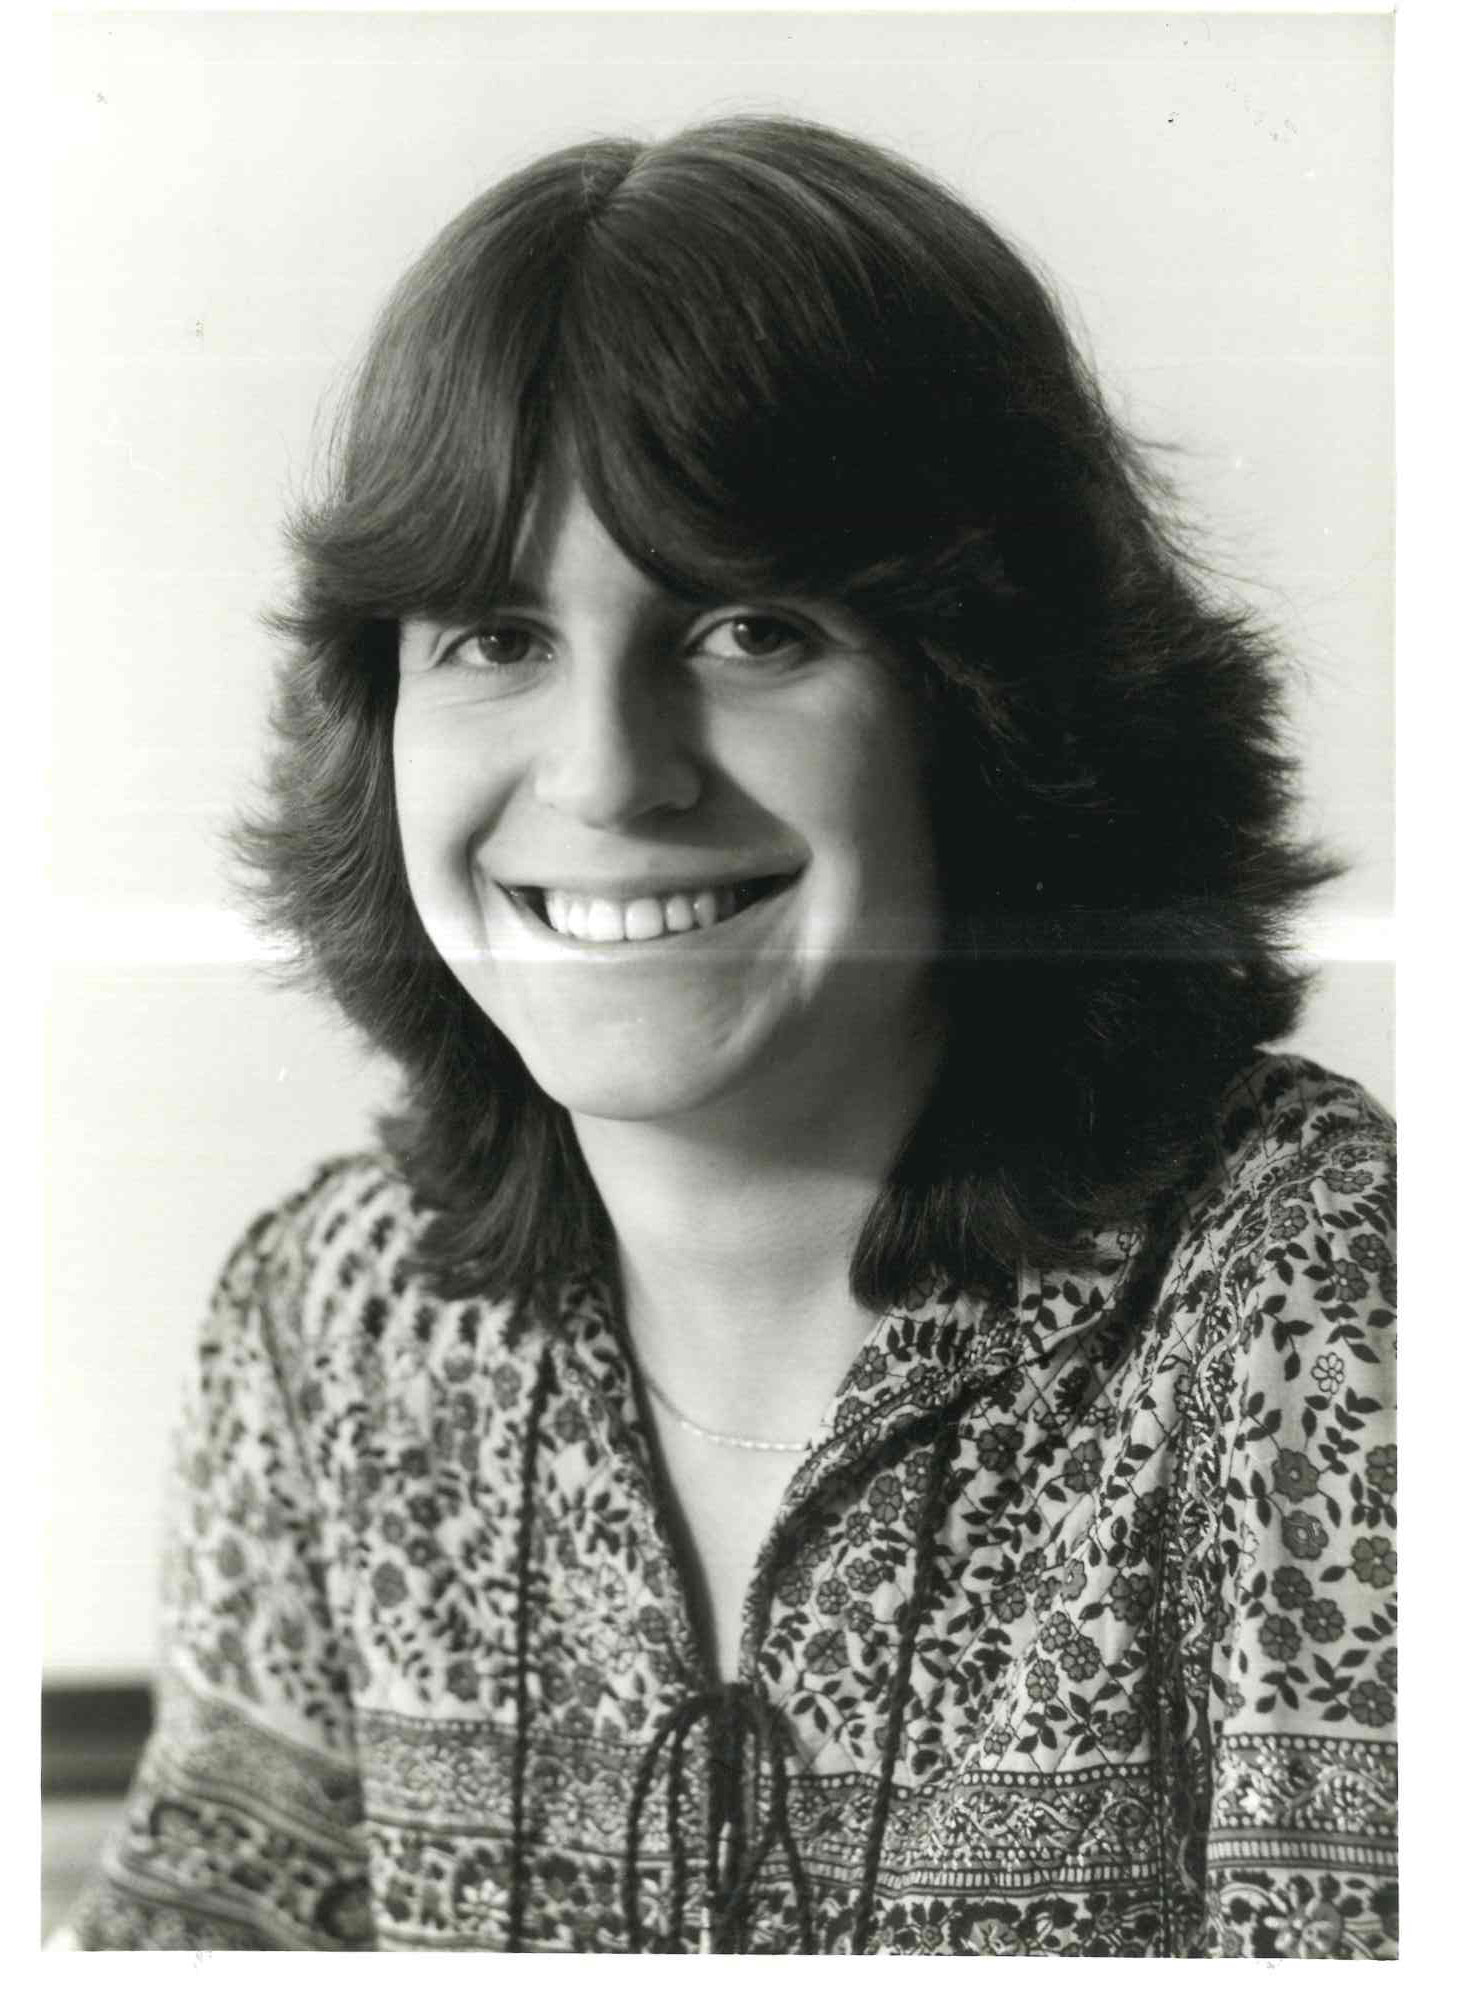 00160-Deborah Crane, 1980- '81.jpg